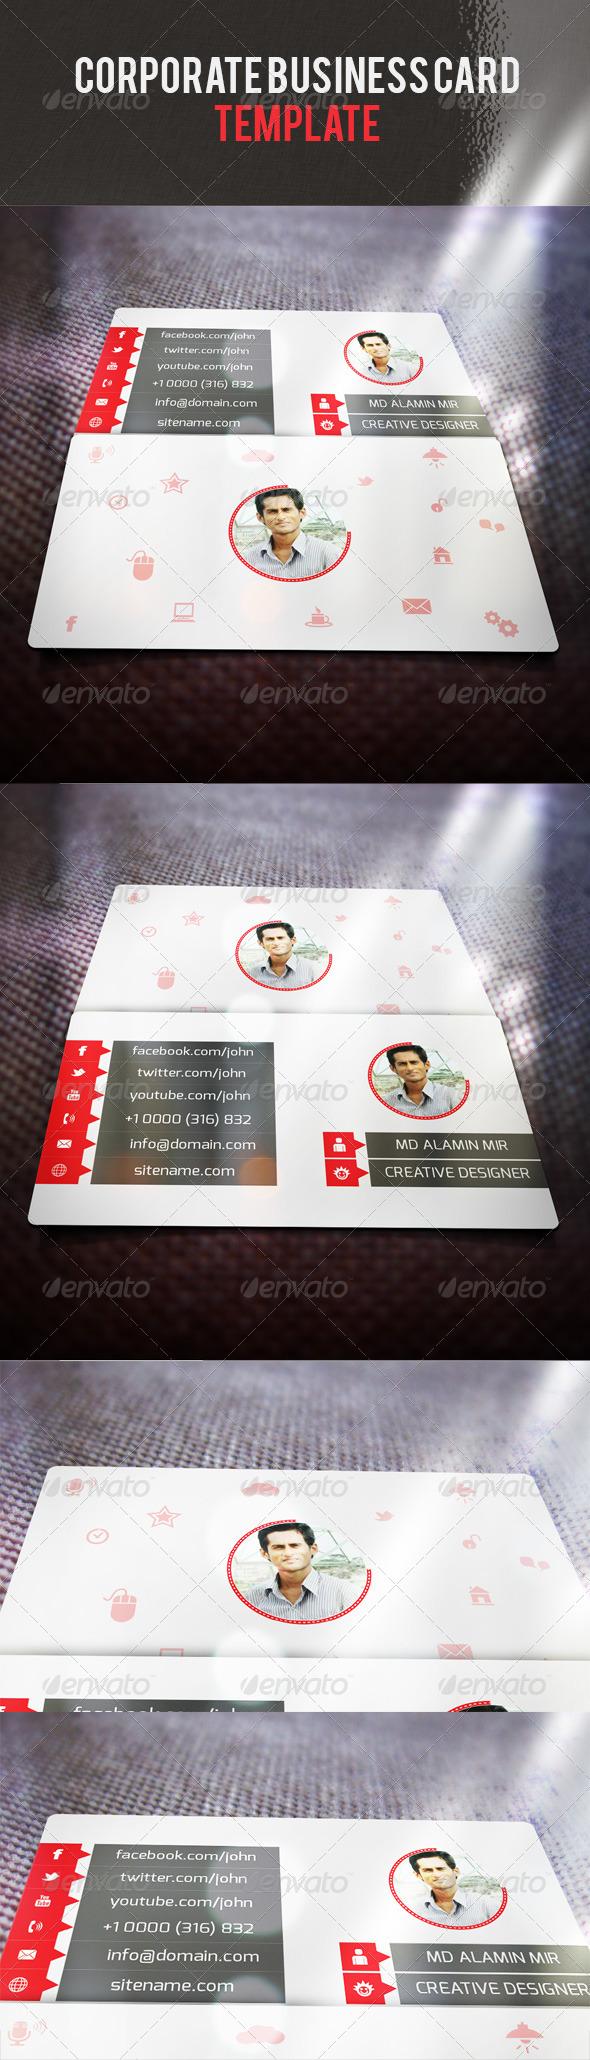 GraphicRiver Corporate Business Card V 37 6176011